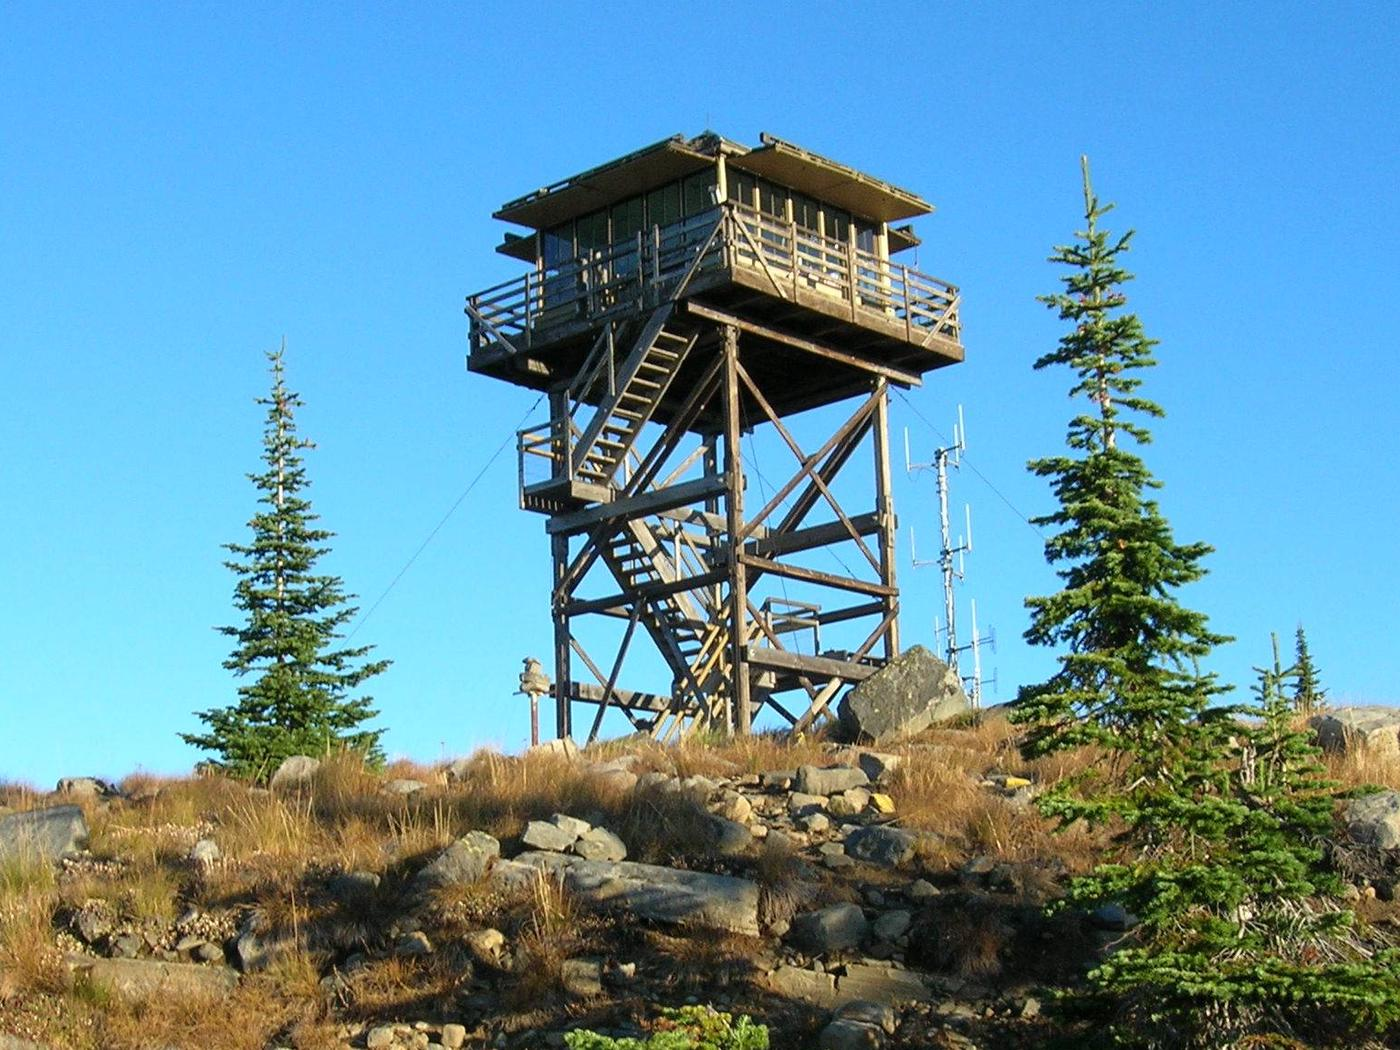 Mt. Baldy-Buckhorn Ridge Lookout